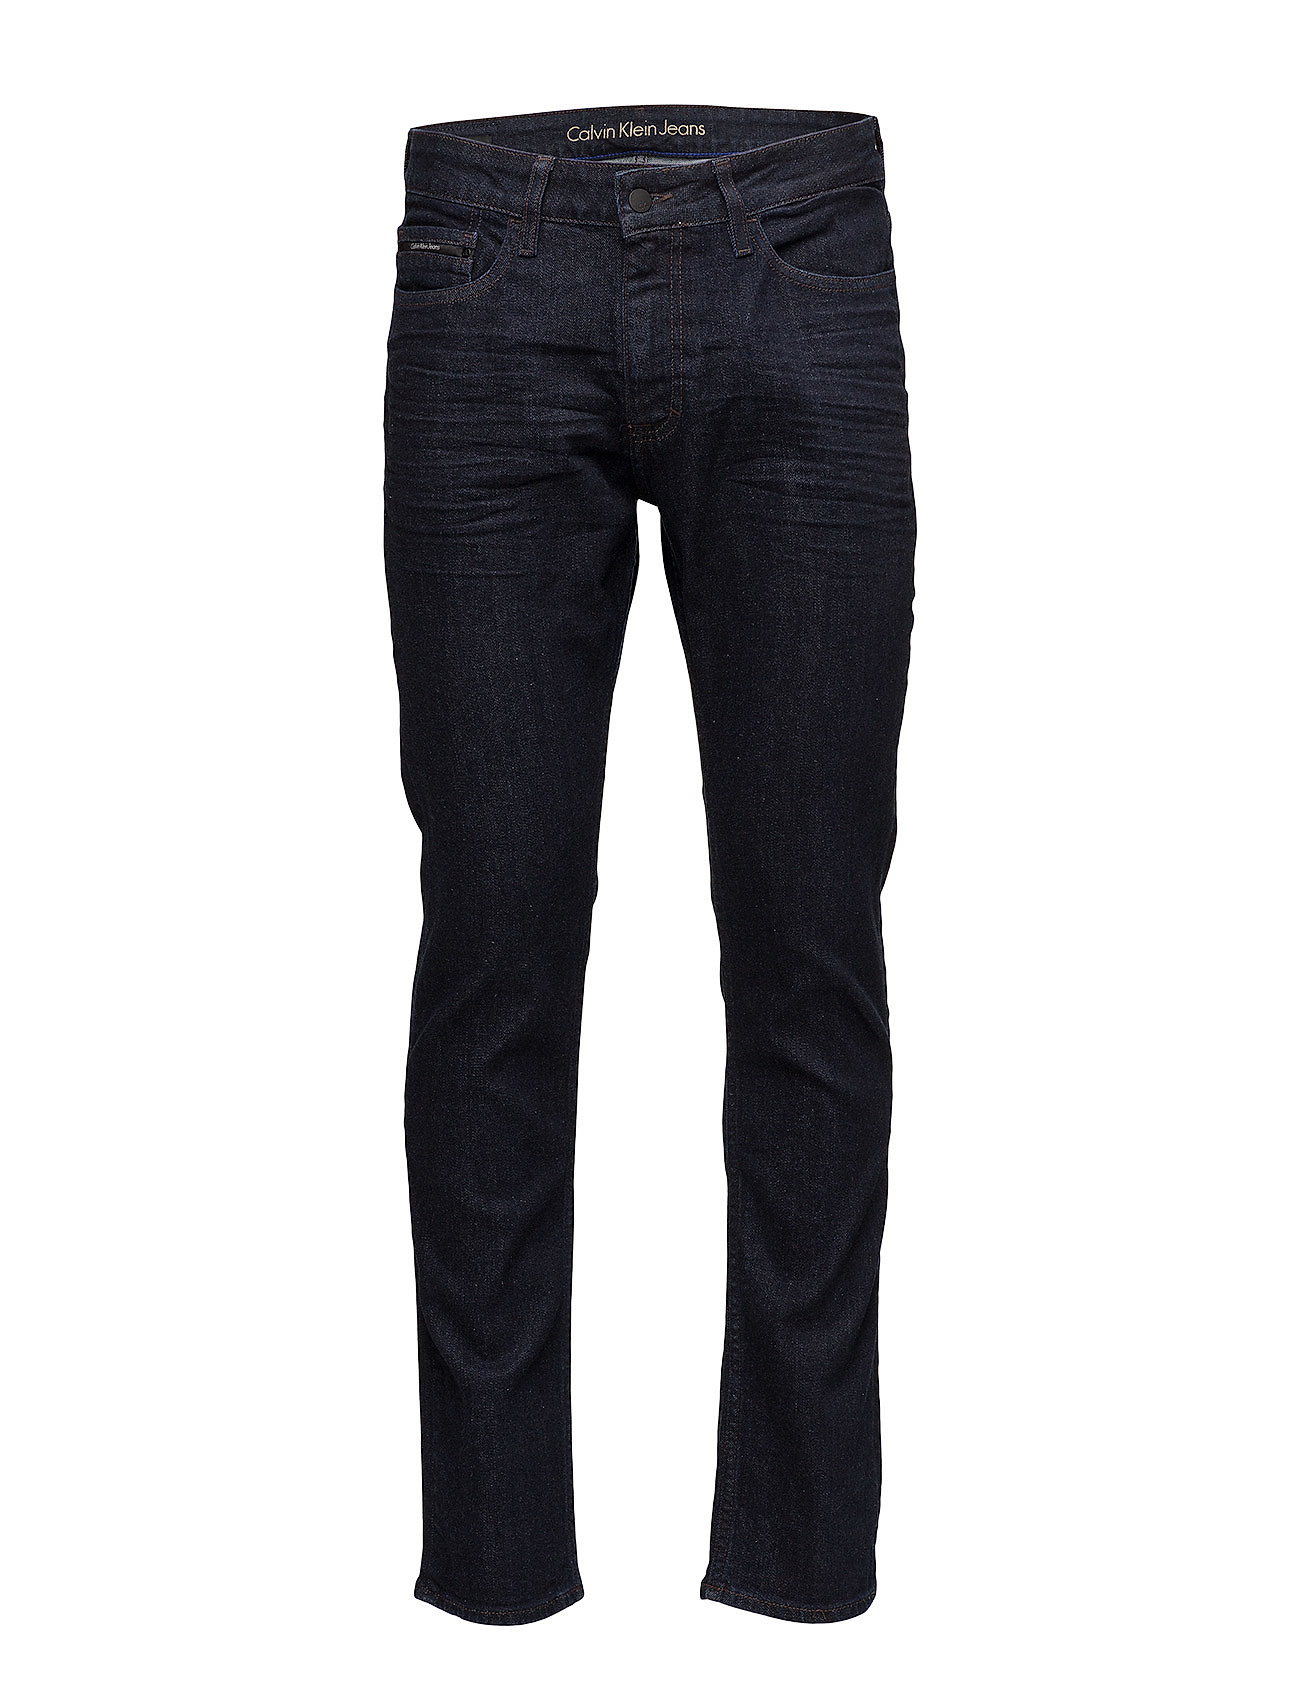 calvin klein jeans – Slim straight - topa på boozt.com dk